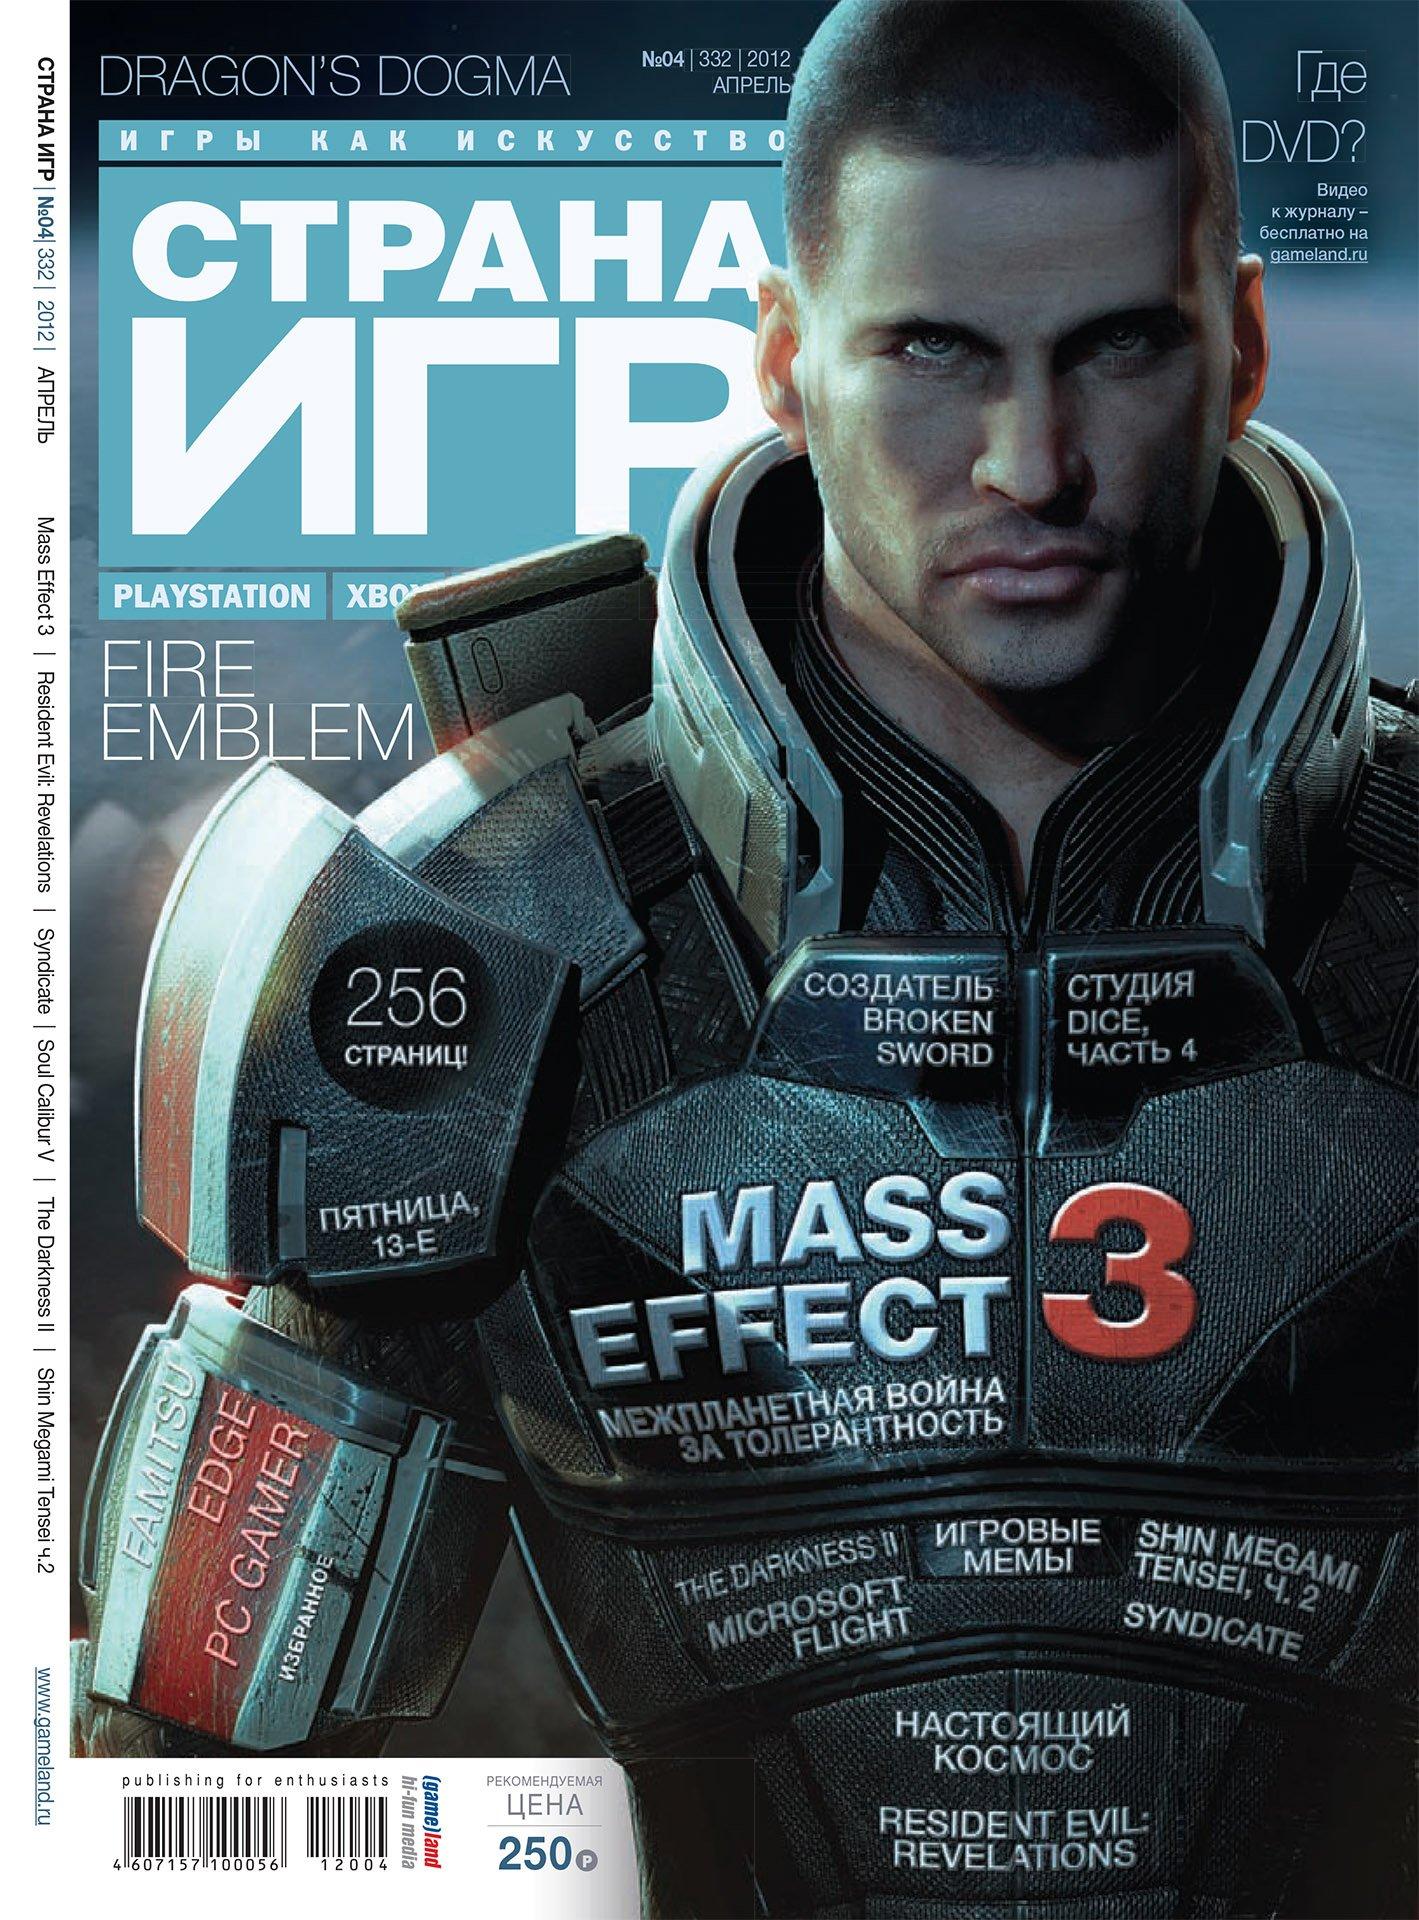 GameLand 332 April 2012 (cover 1)